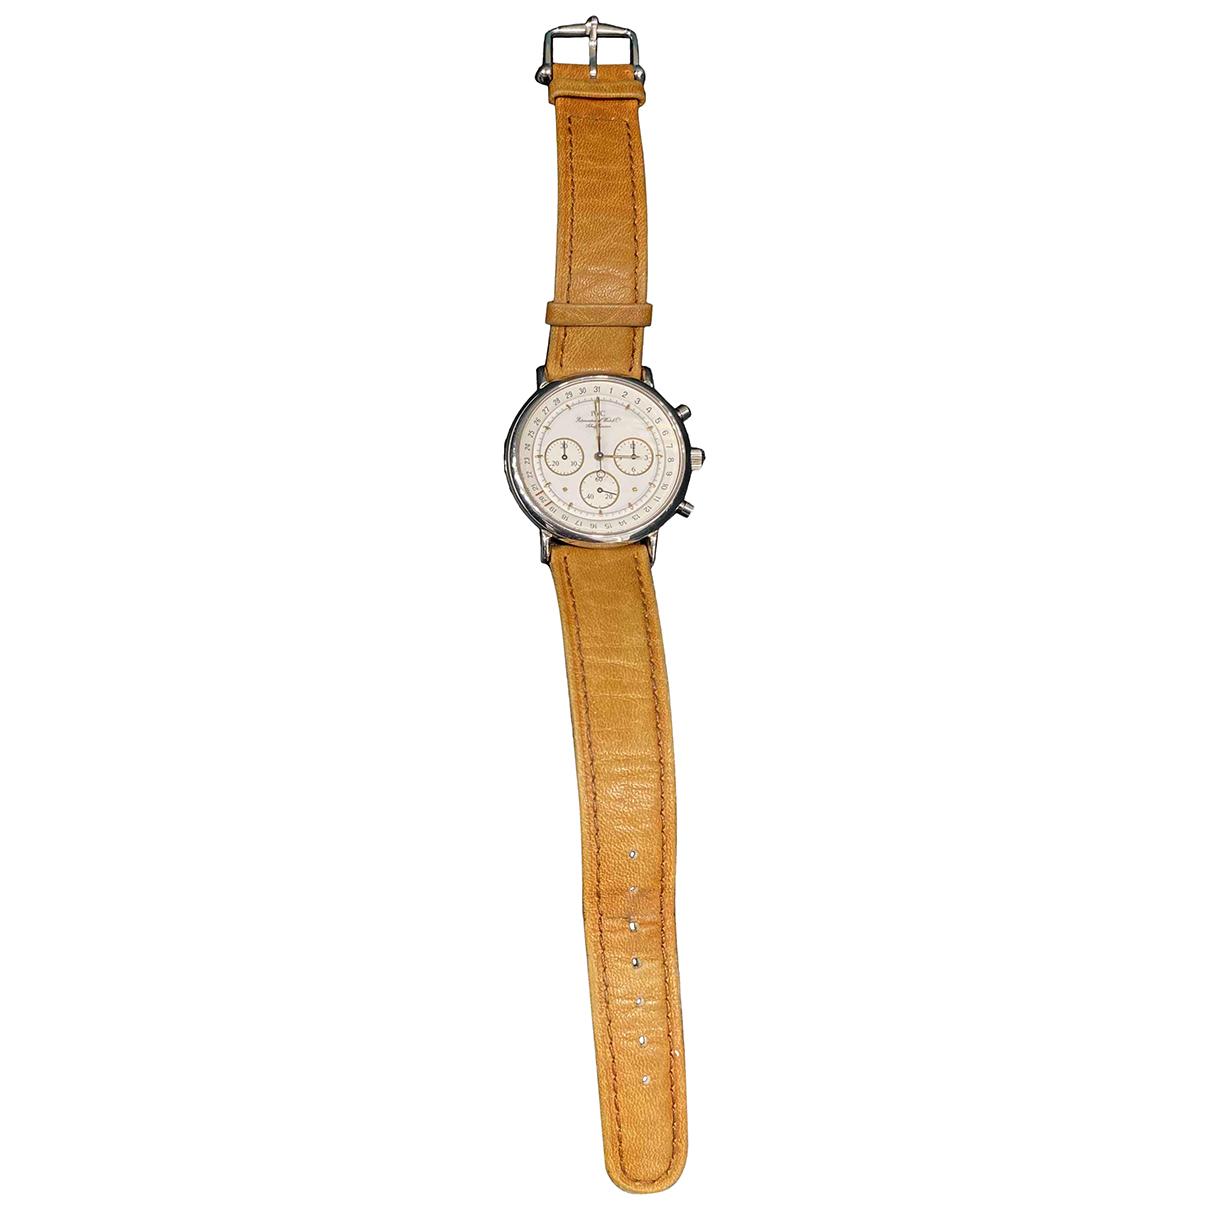 Iwc Portofino Uhr in  Braun Stahl